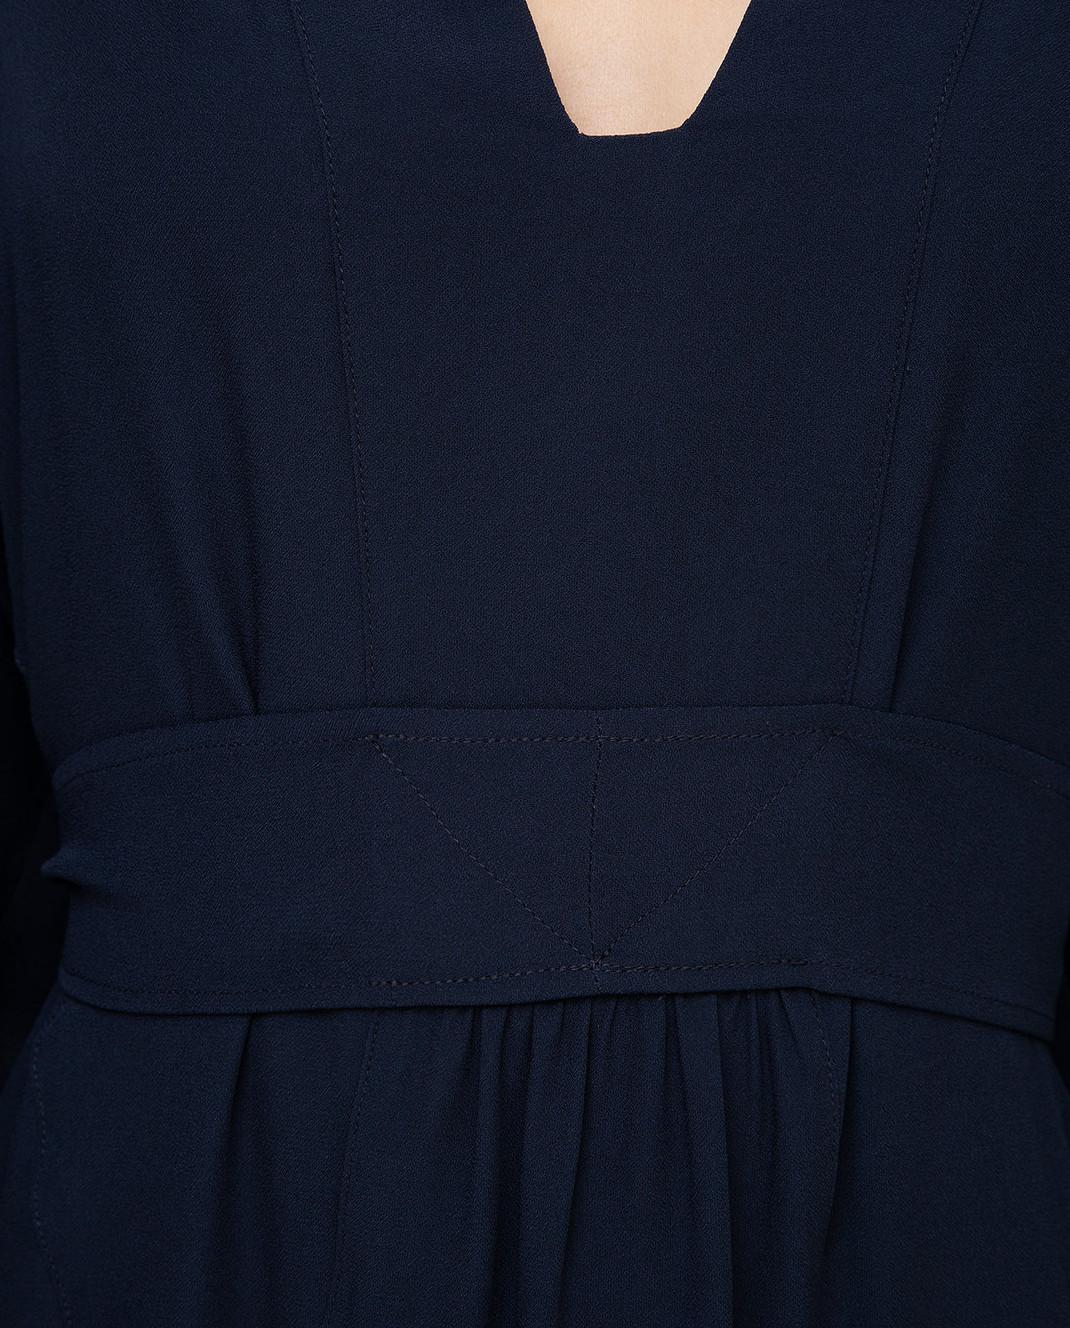 Max Mara Sportmax Темно-синее платье изображение 5